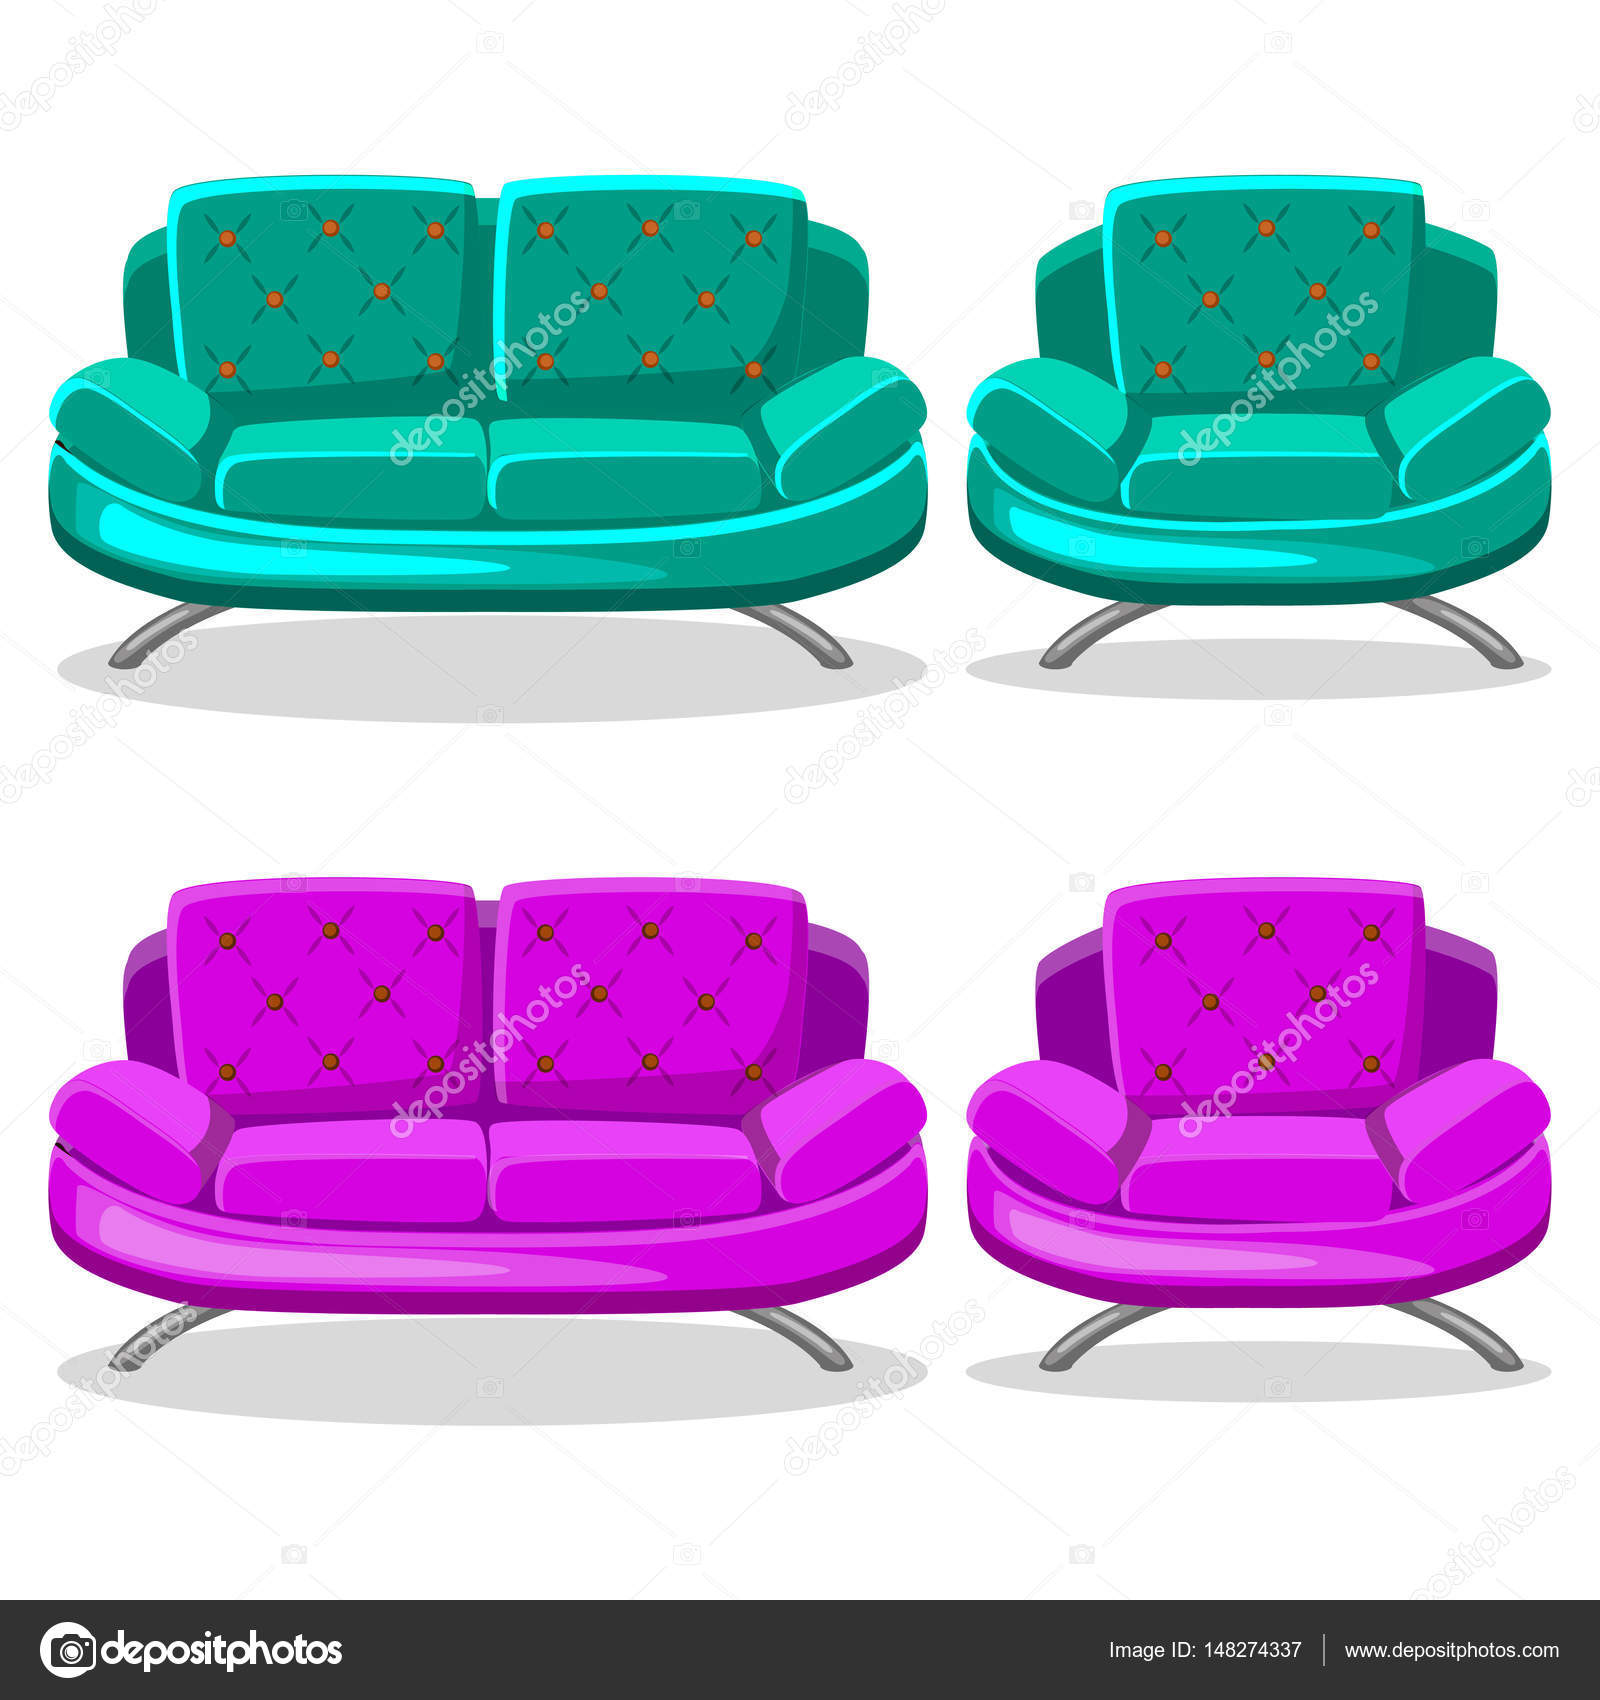 Cartoon Colorful Armchair And Sofa, Set 9 In Vector U2014 Photo By  BabySofja.gmail.com